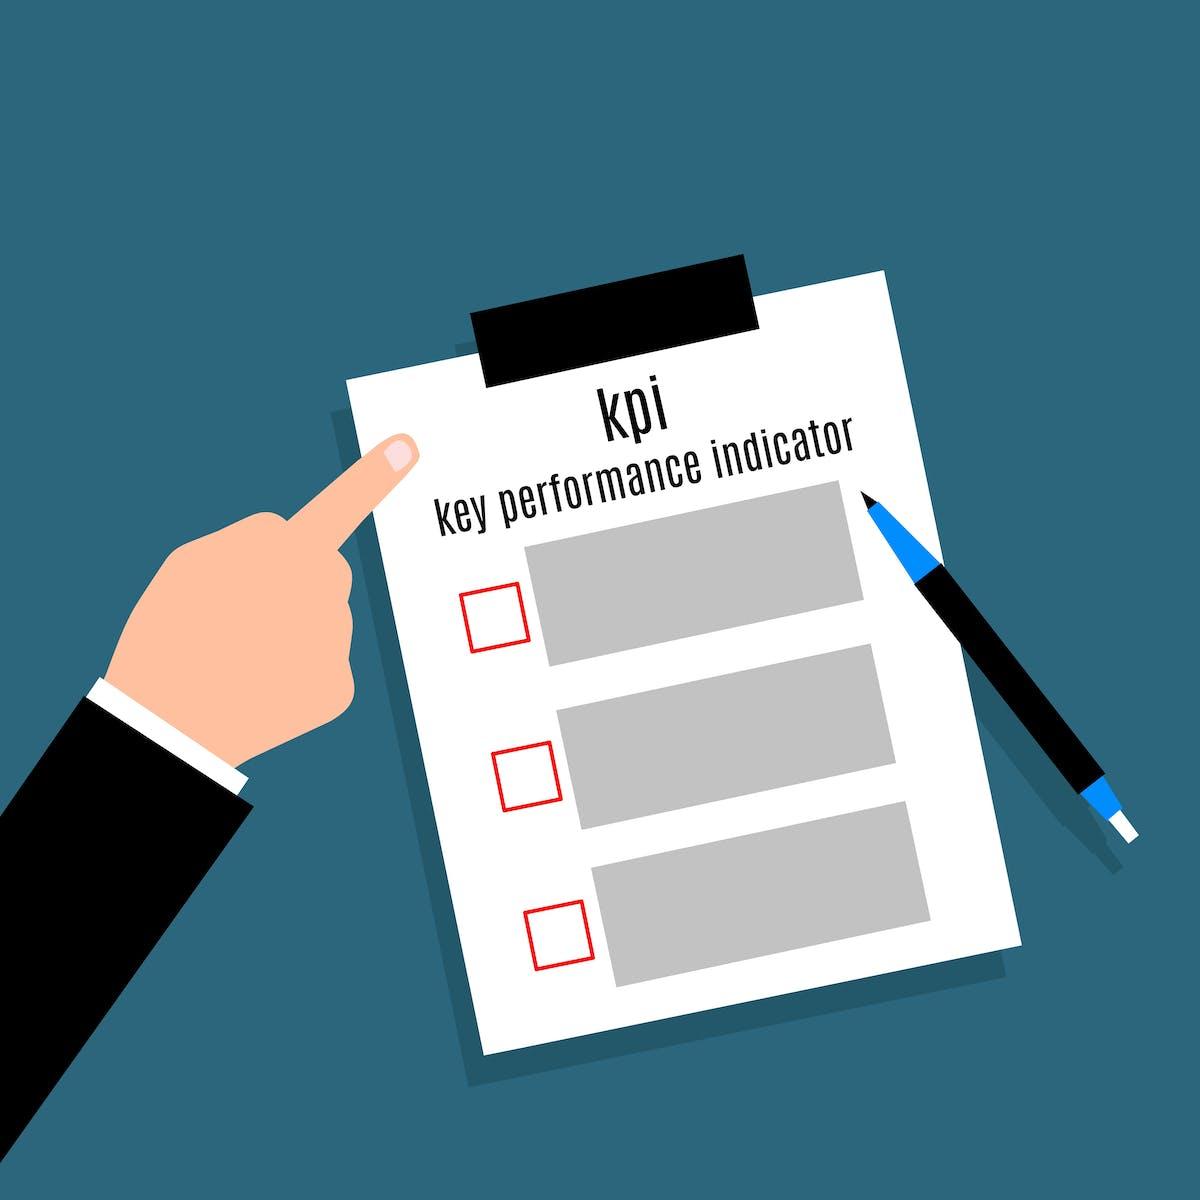 Titelbild-KPI-KPIs-Key-Performance-Indikator-Business-Zahlen-Erfolg-pixabay-4266500-mohamed_hassan